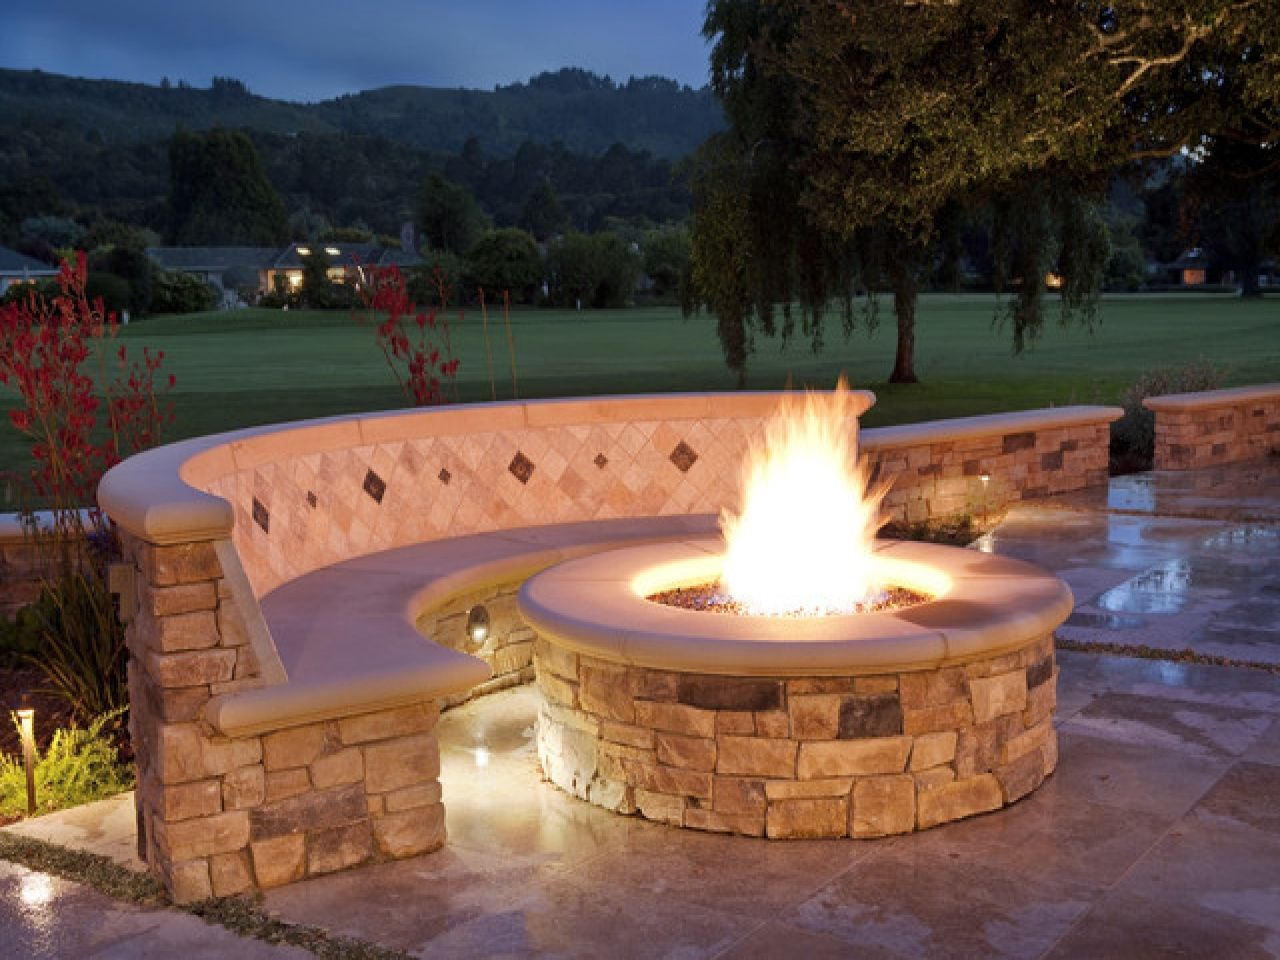 Inspiration for Backyard Fire Pit Designs   Fire pit patio set, Fire ...